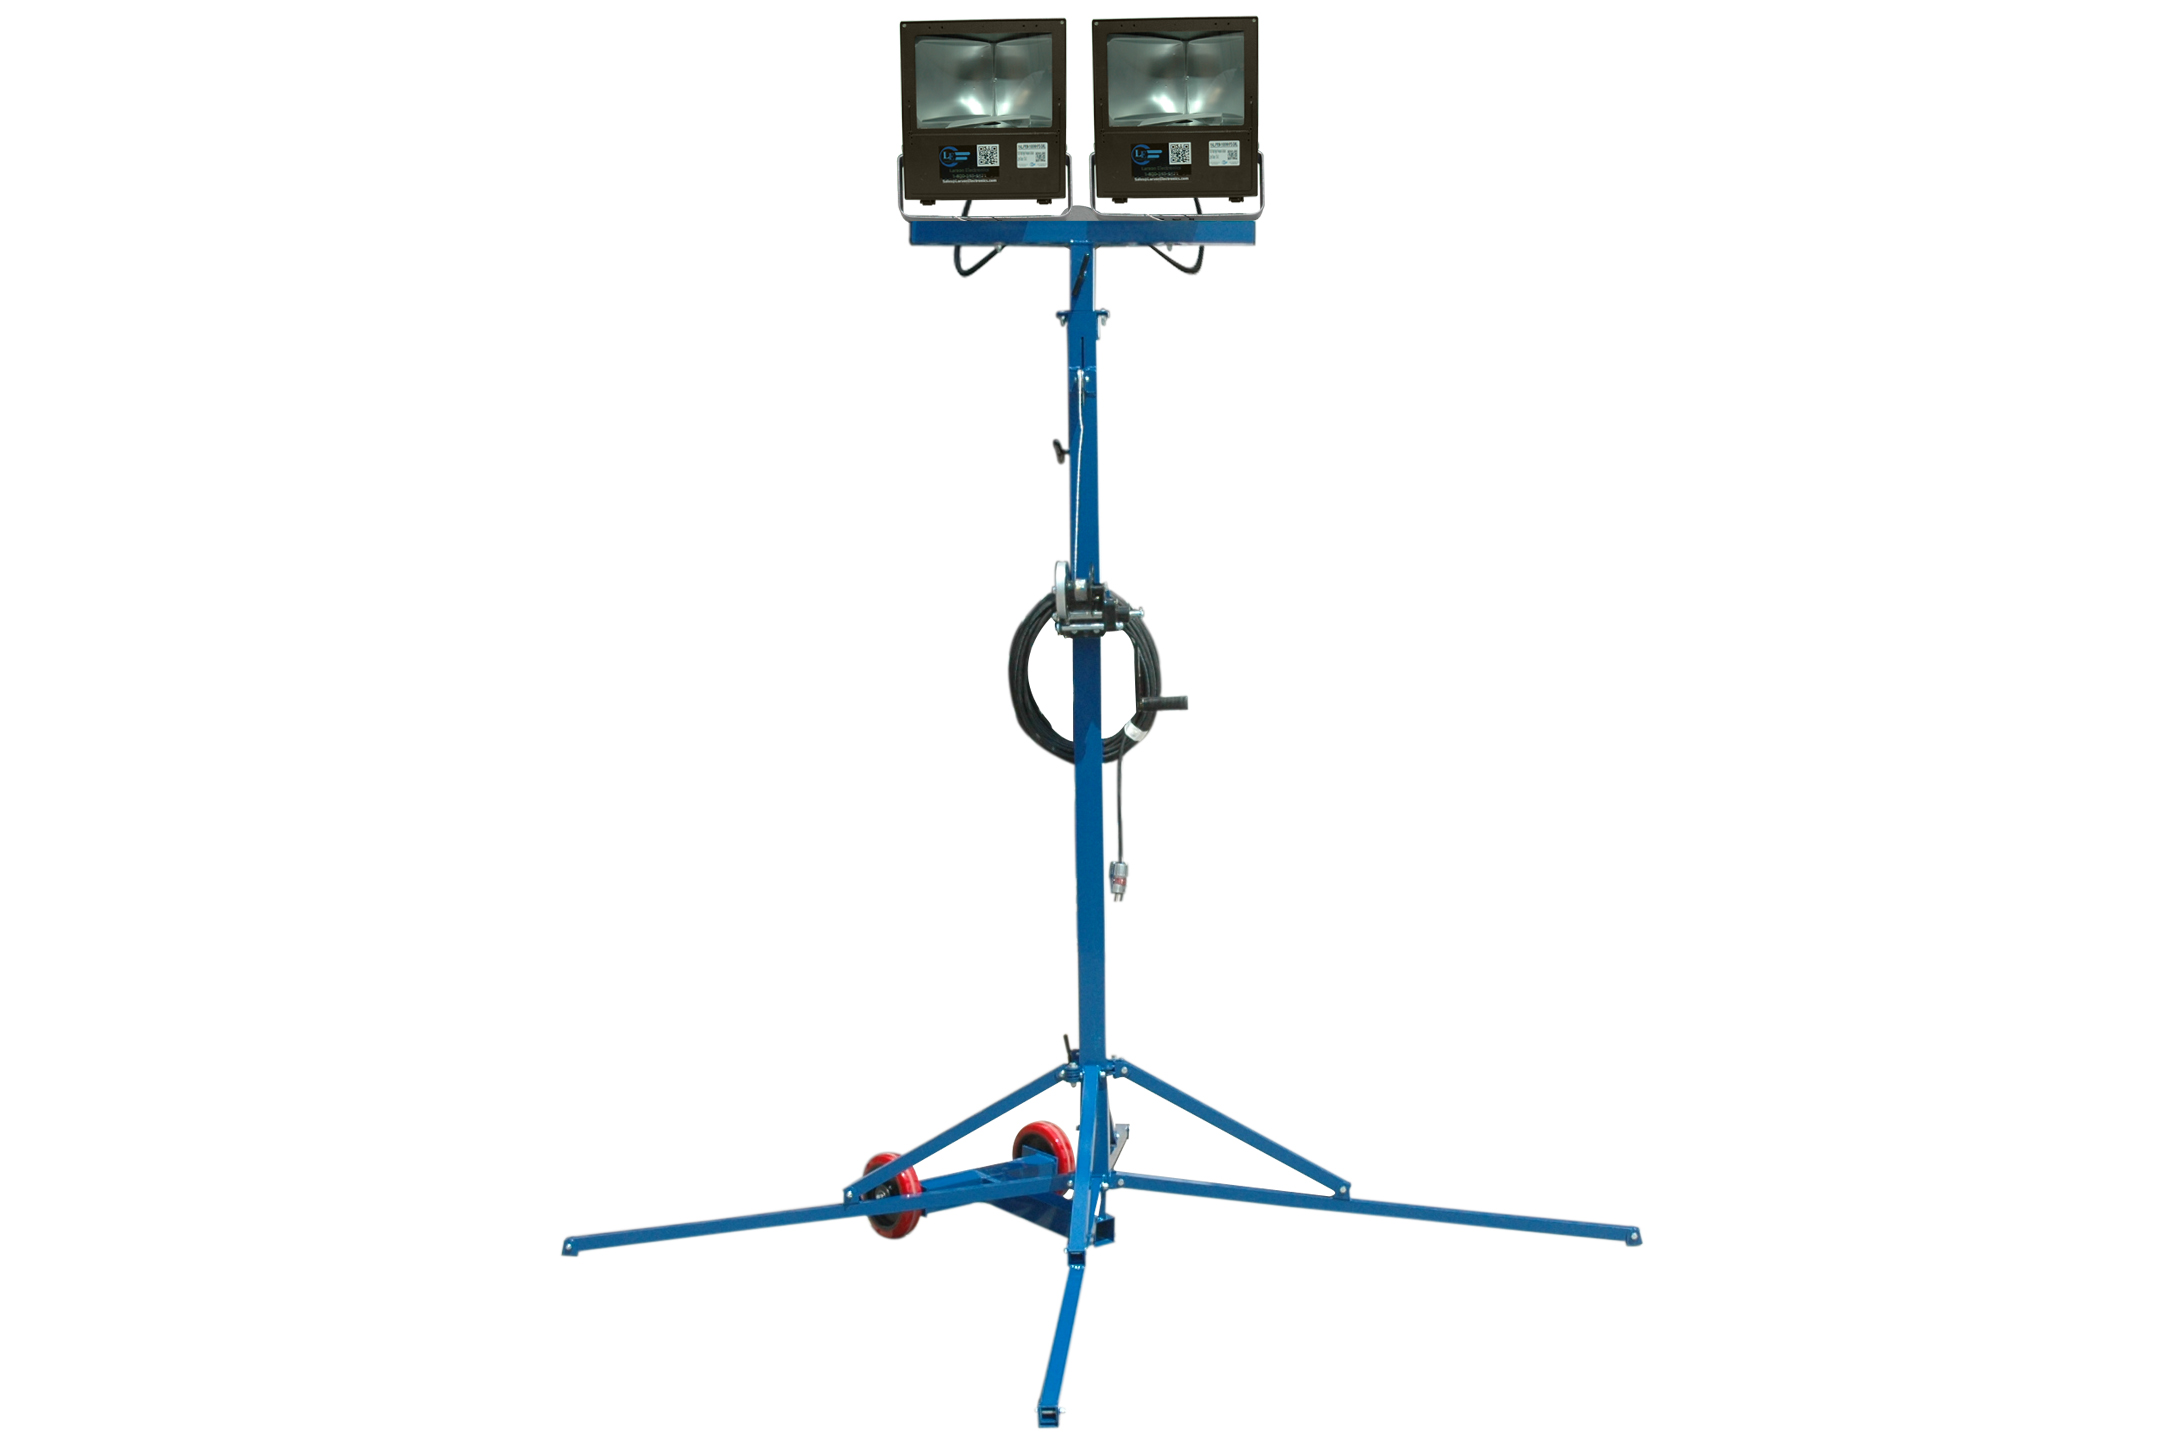 12 Telescoping Light Mast Equipped With Two Watt Metal Halide Light Fixtures Released By